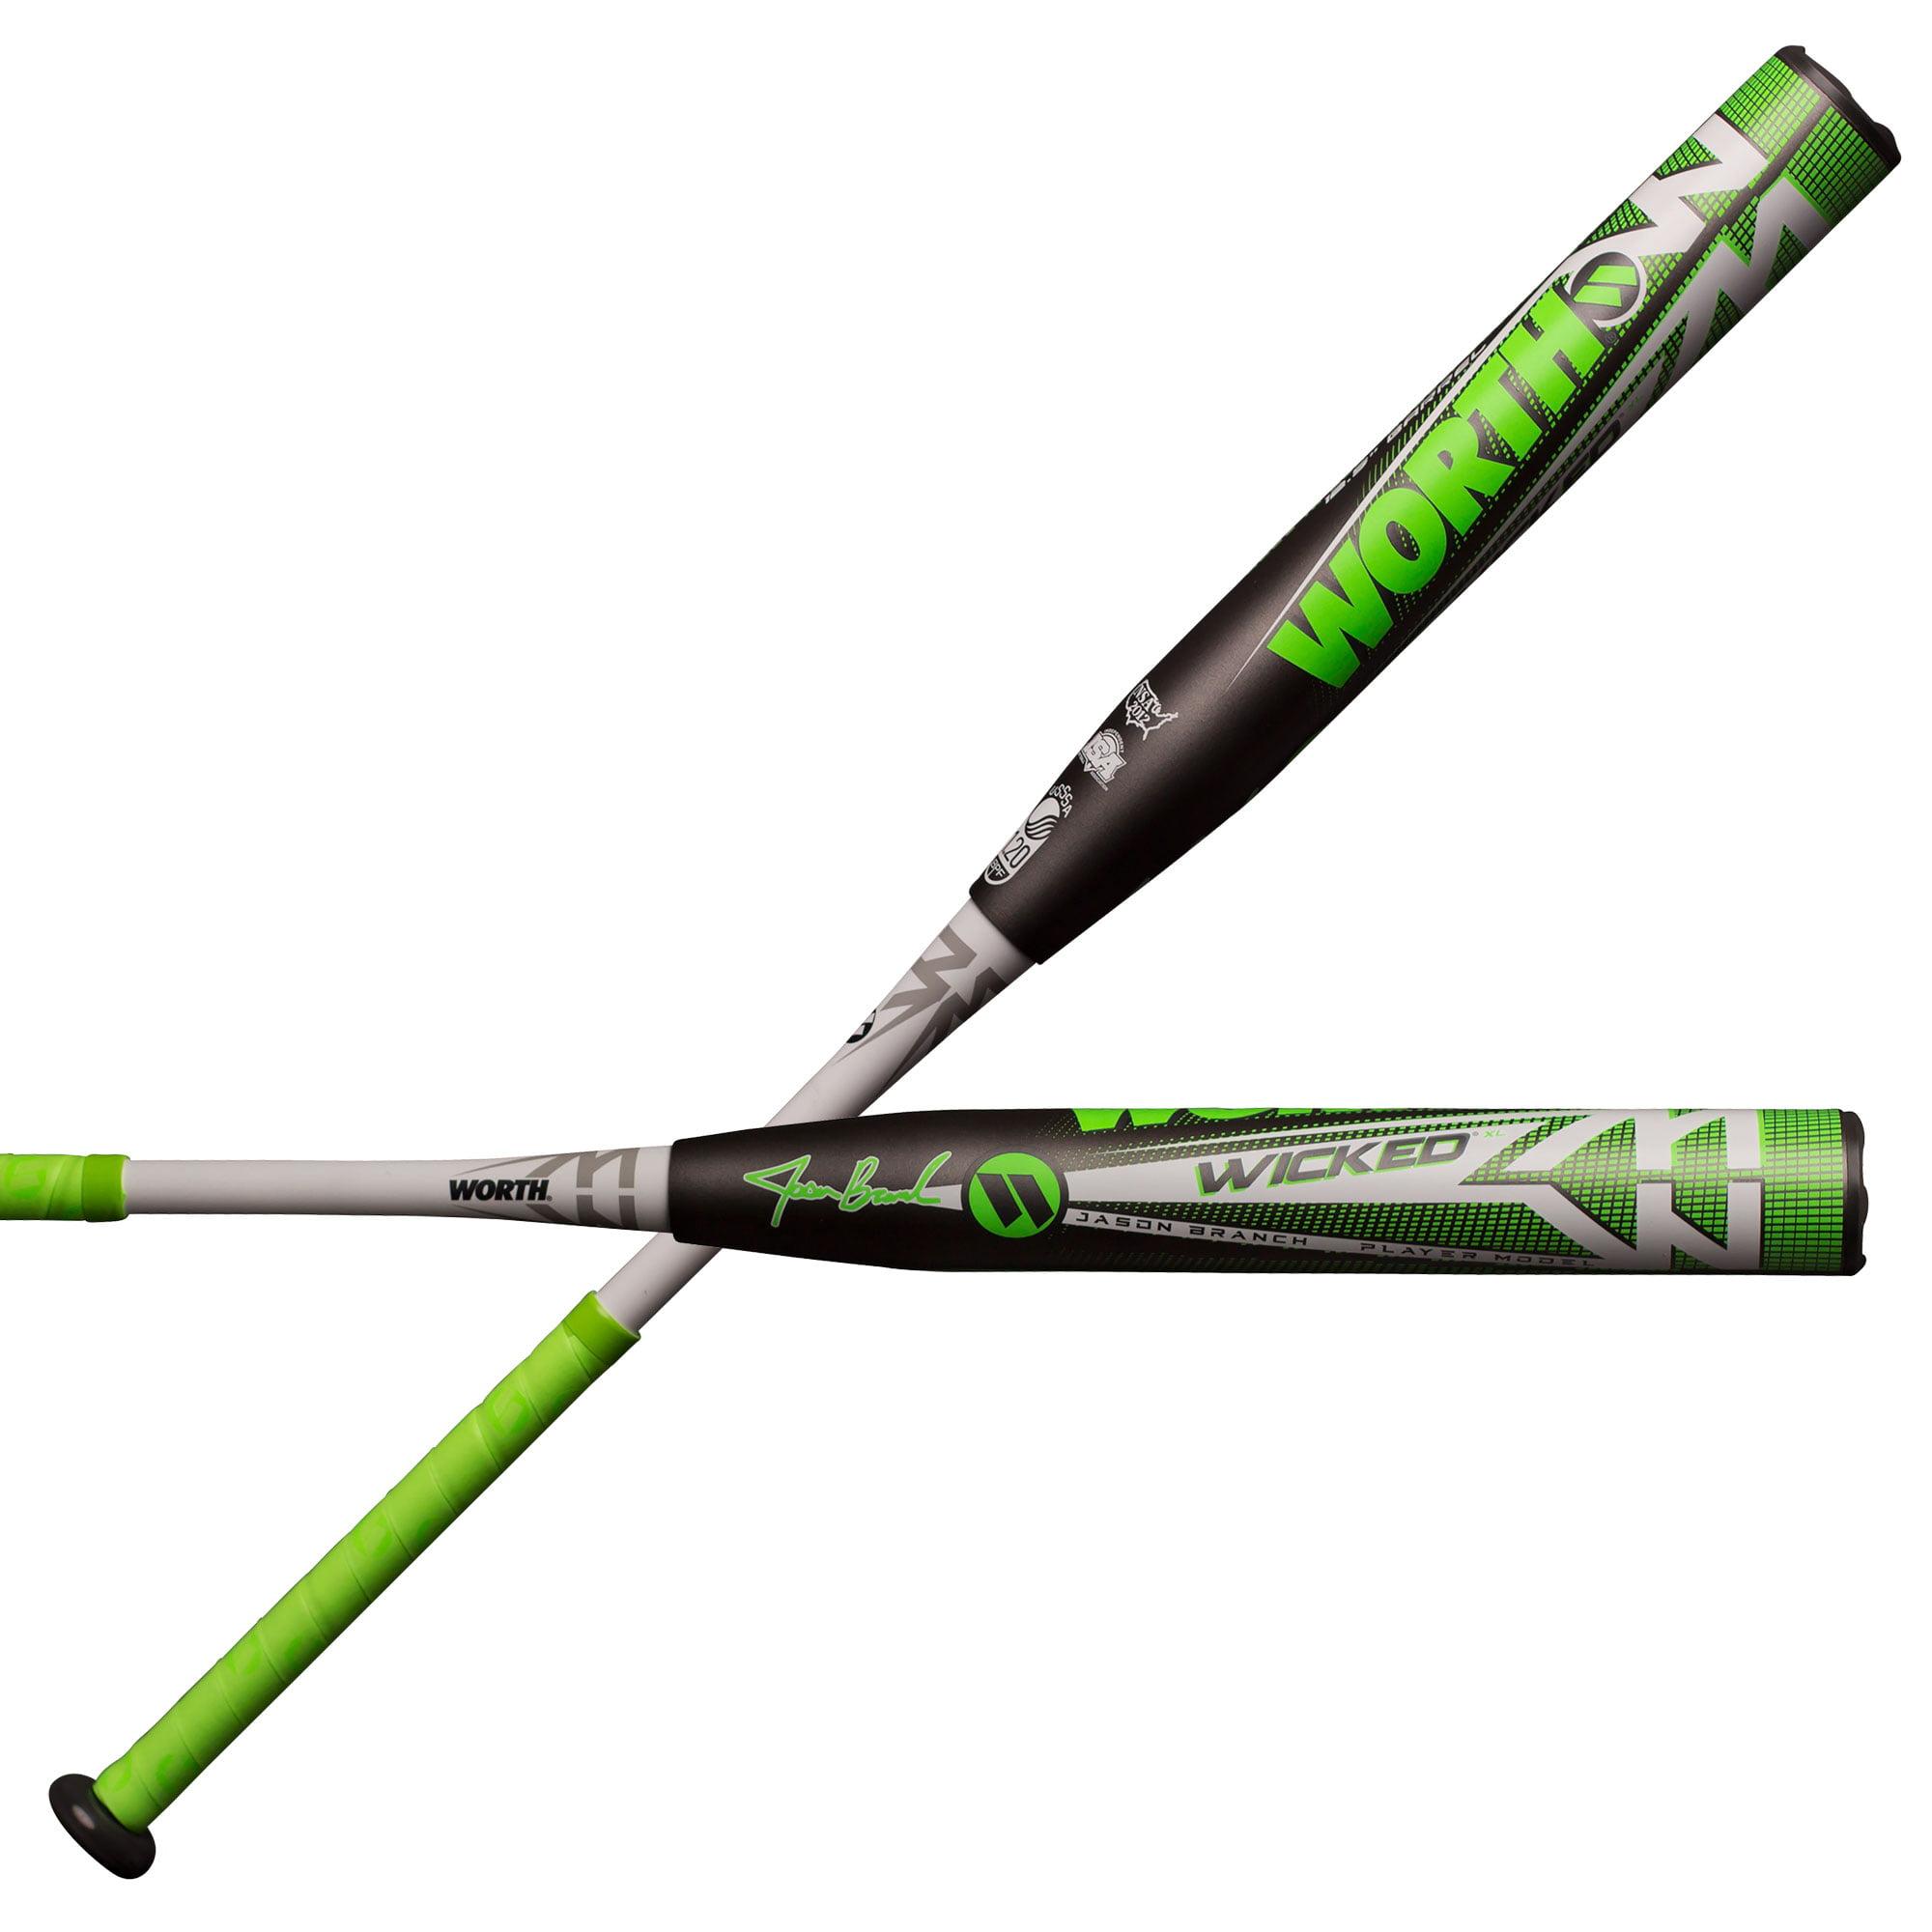 Worth Wicked XL Jason Branch USSSA WKJBMU Slowpitch Softball Bat